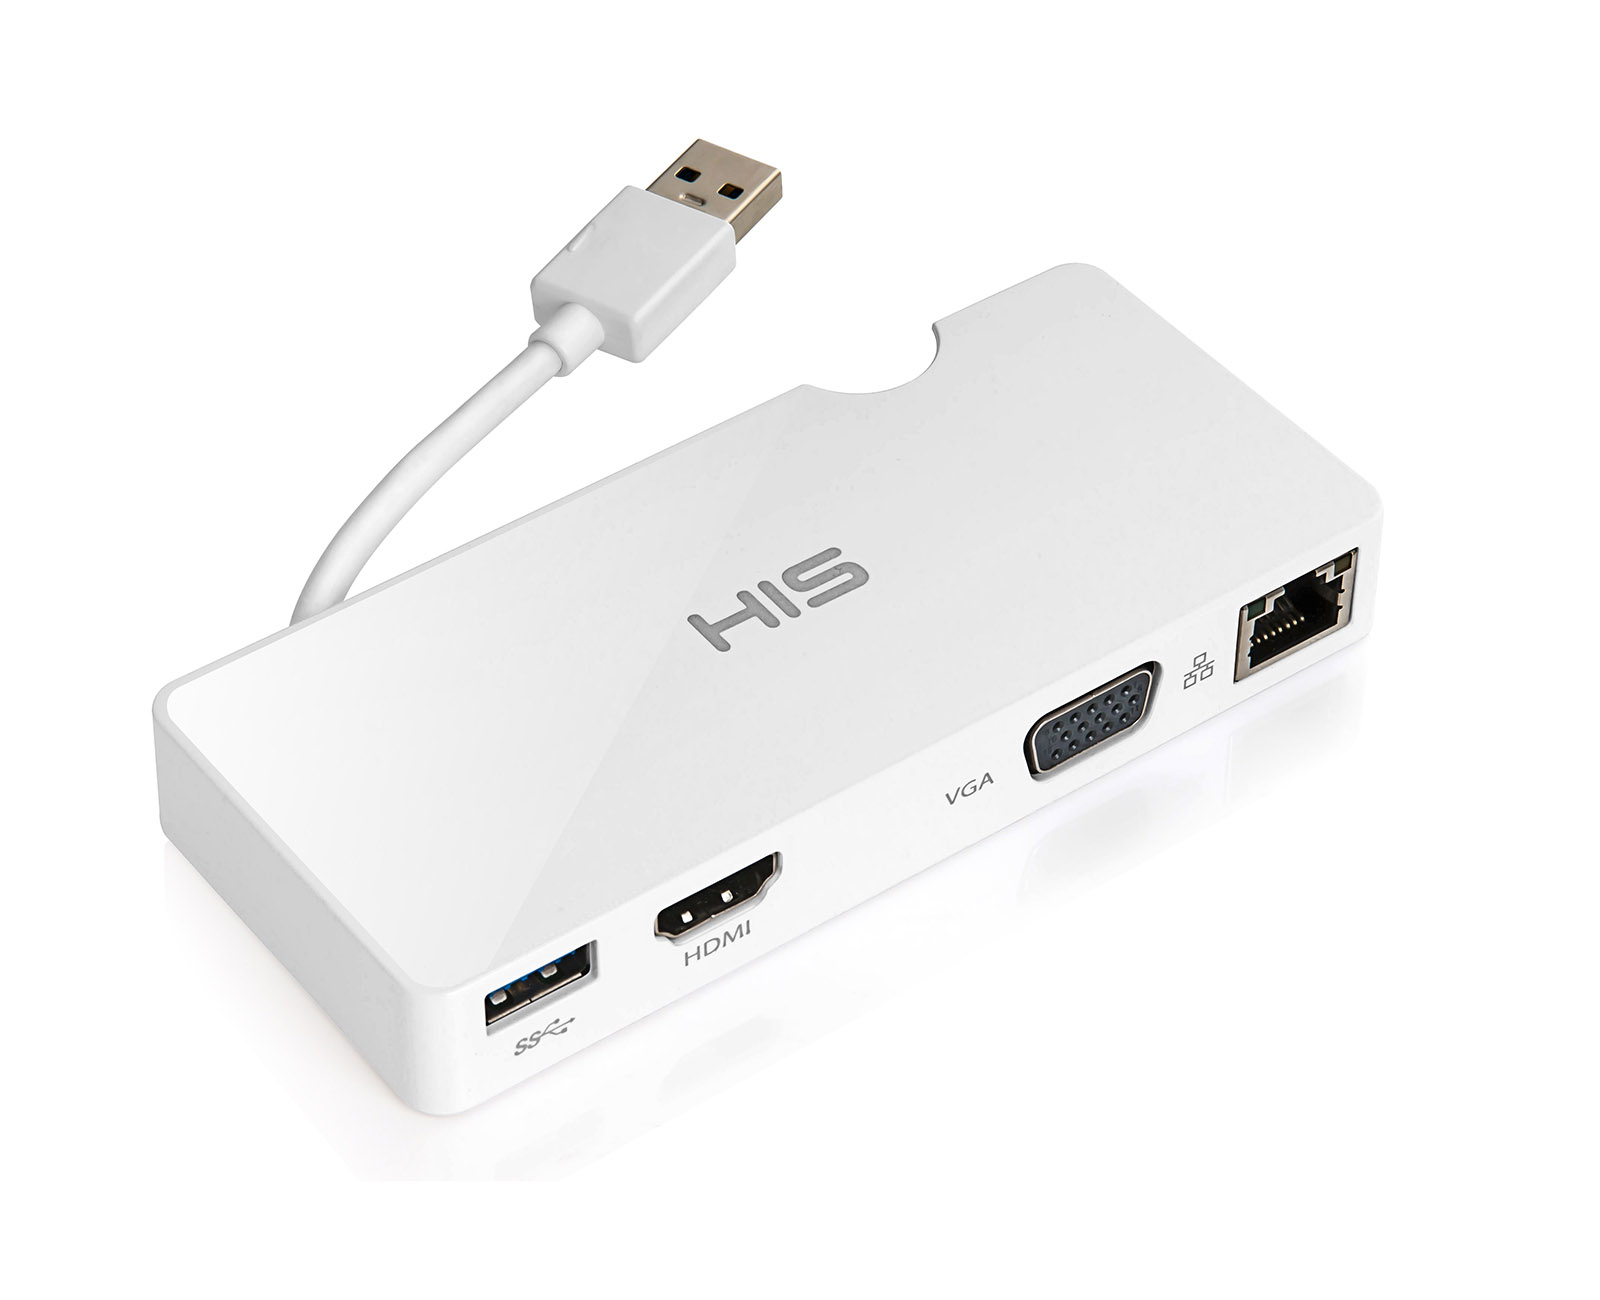 HIS Multi-View USB Portable Docking Station, Gigabit Ethernet for ...